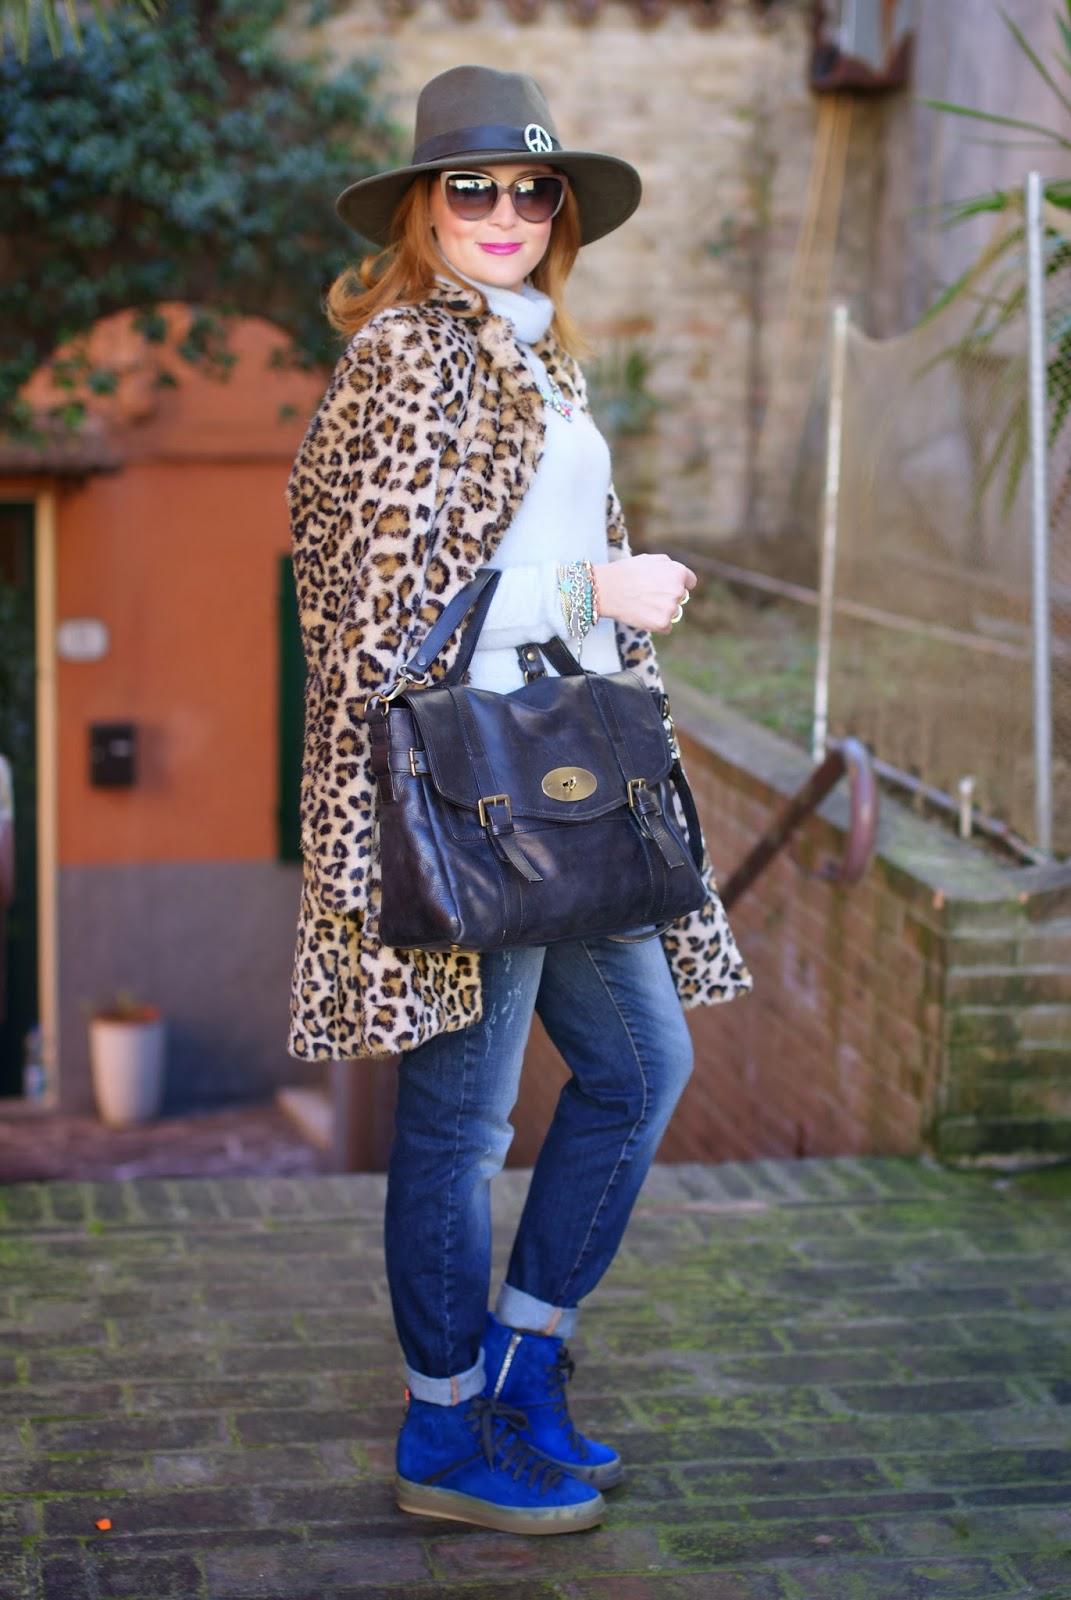 leopard faux fur coat, Ecua-Andino australian hat, Ruco Line blue sneakers, satchel bag, Fashion and Cookies, fashion blogger